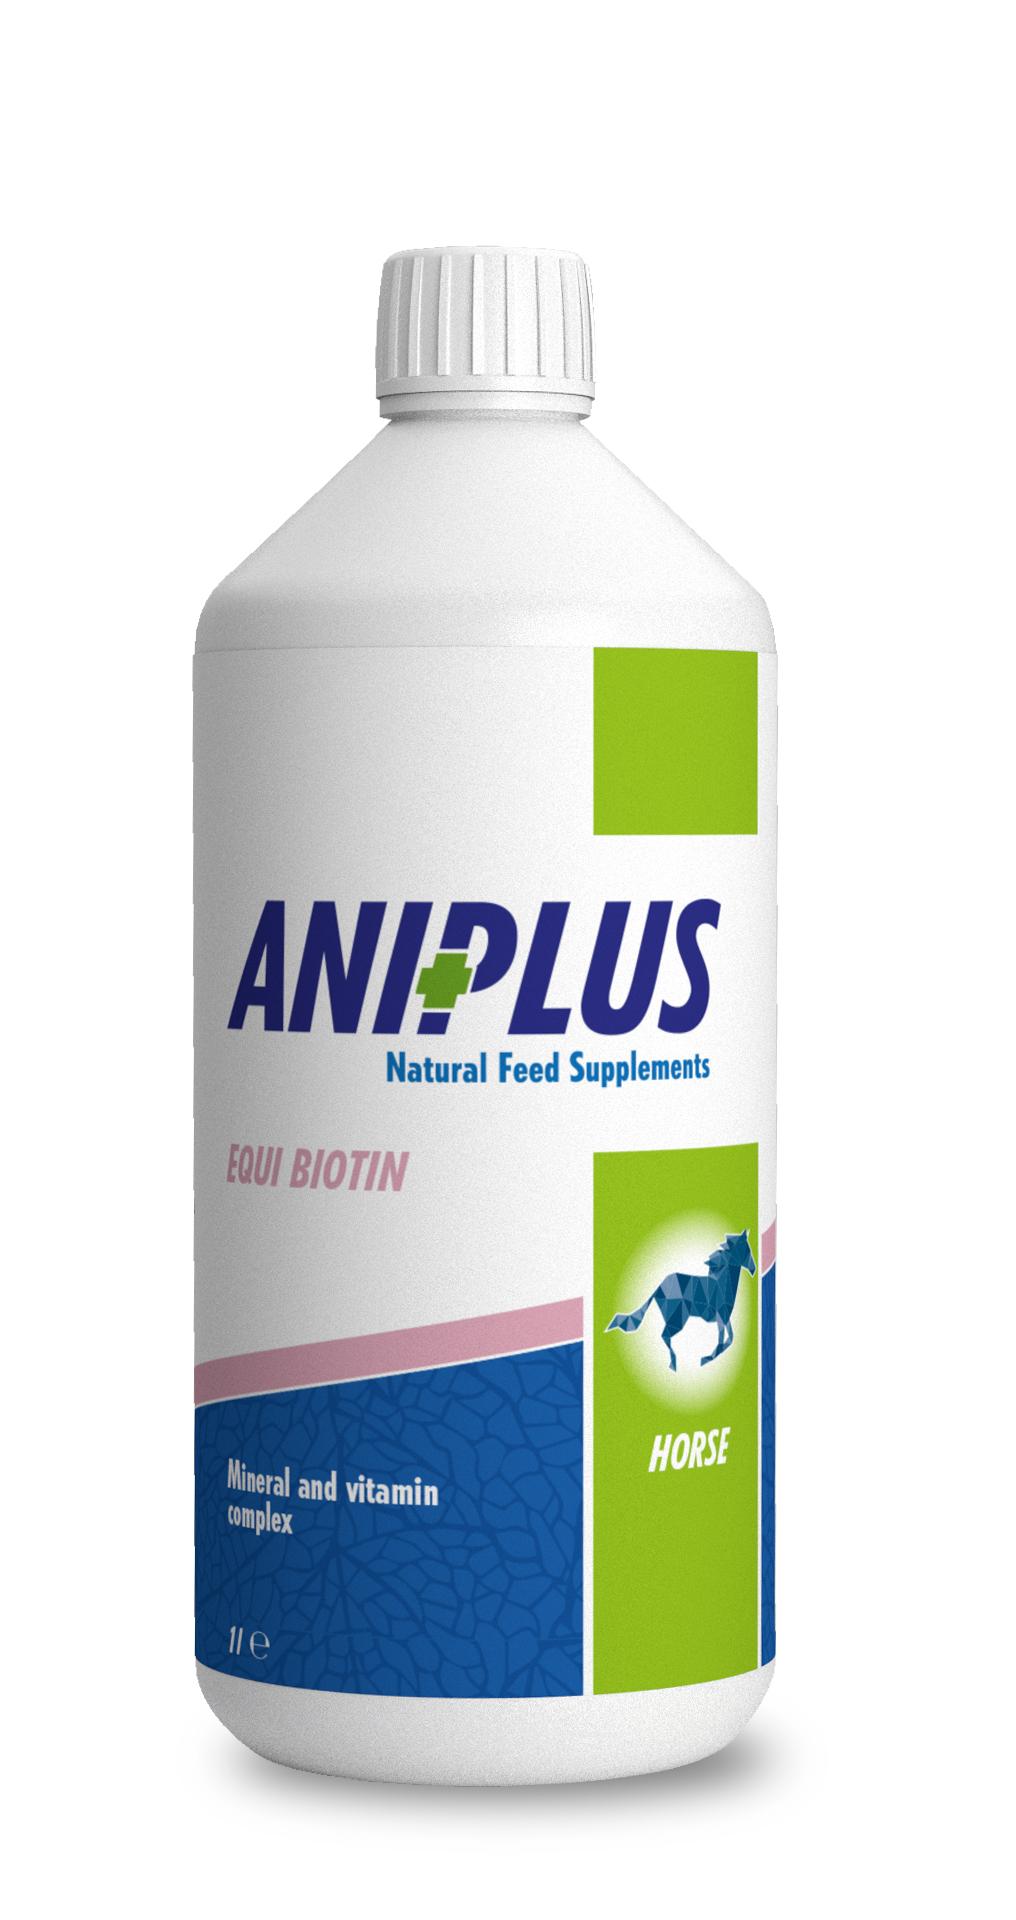 Aniplus_1L-Equi-Biotin